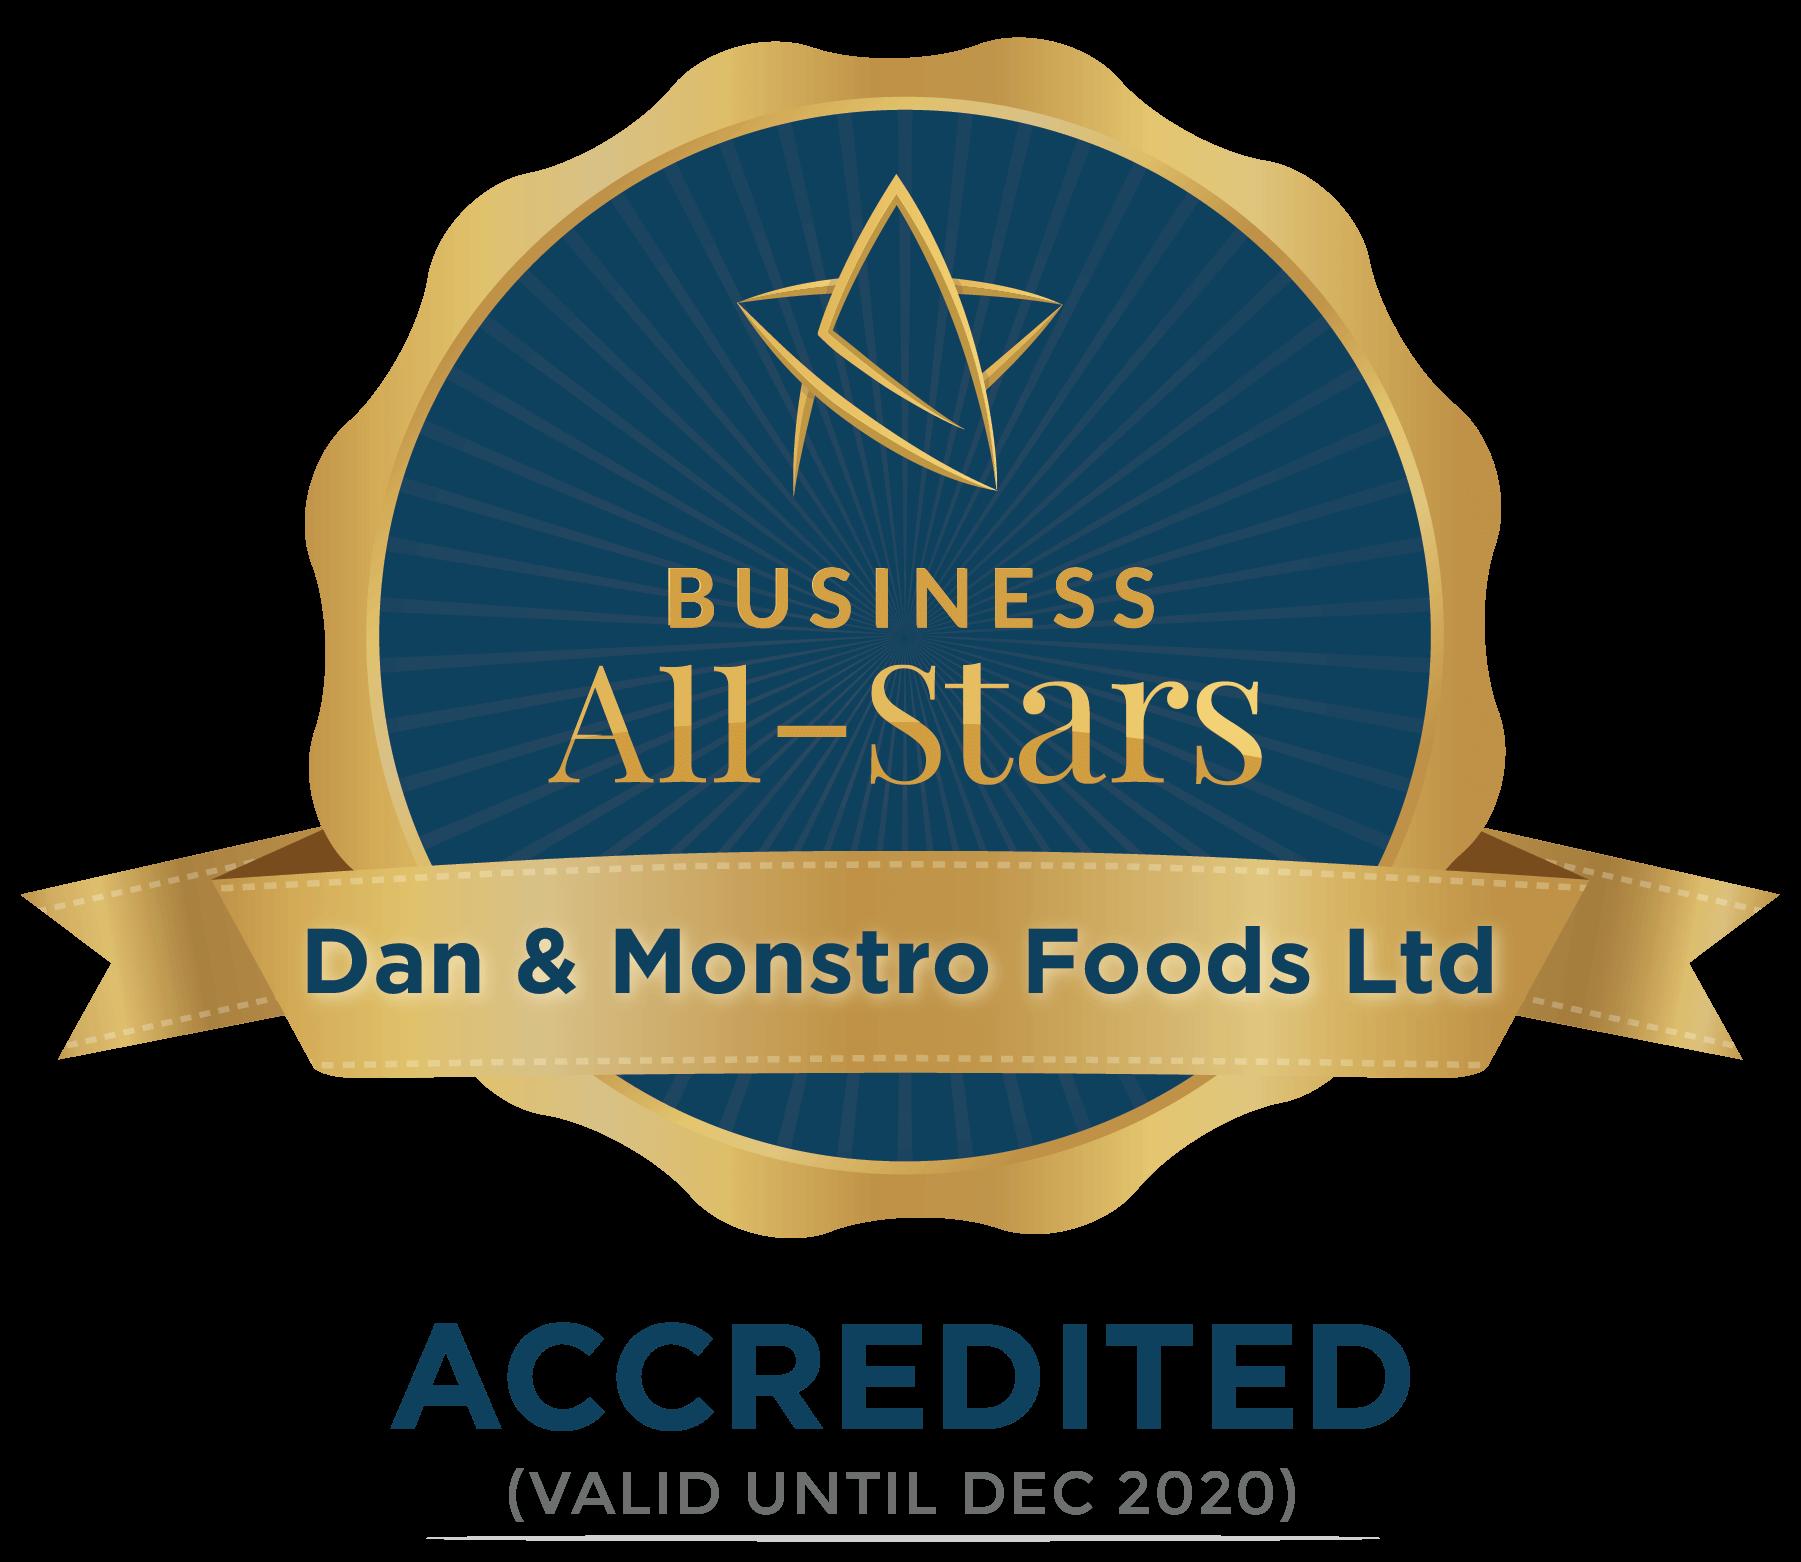 Dan & Monstro Foods Ltd - Business All-Stars Accreditation